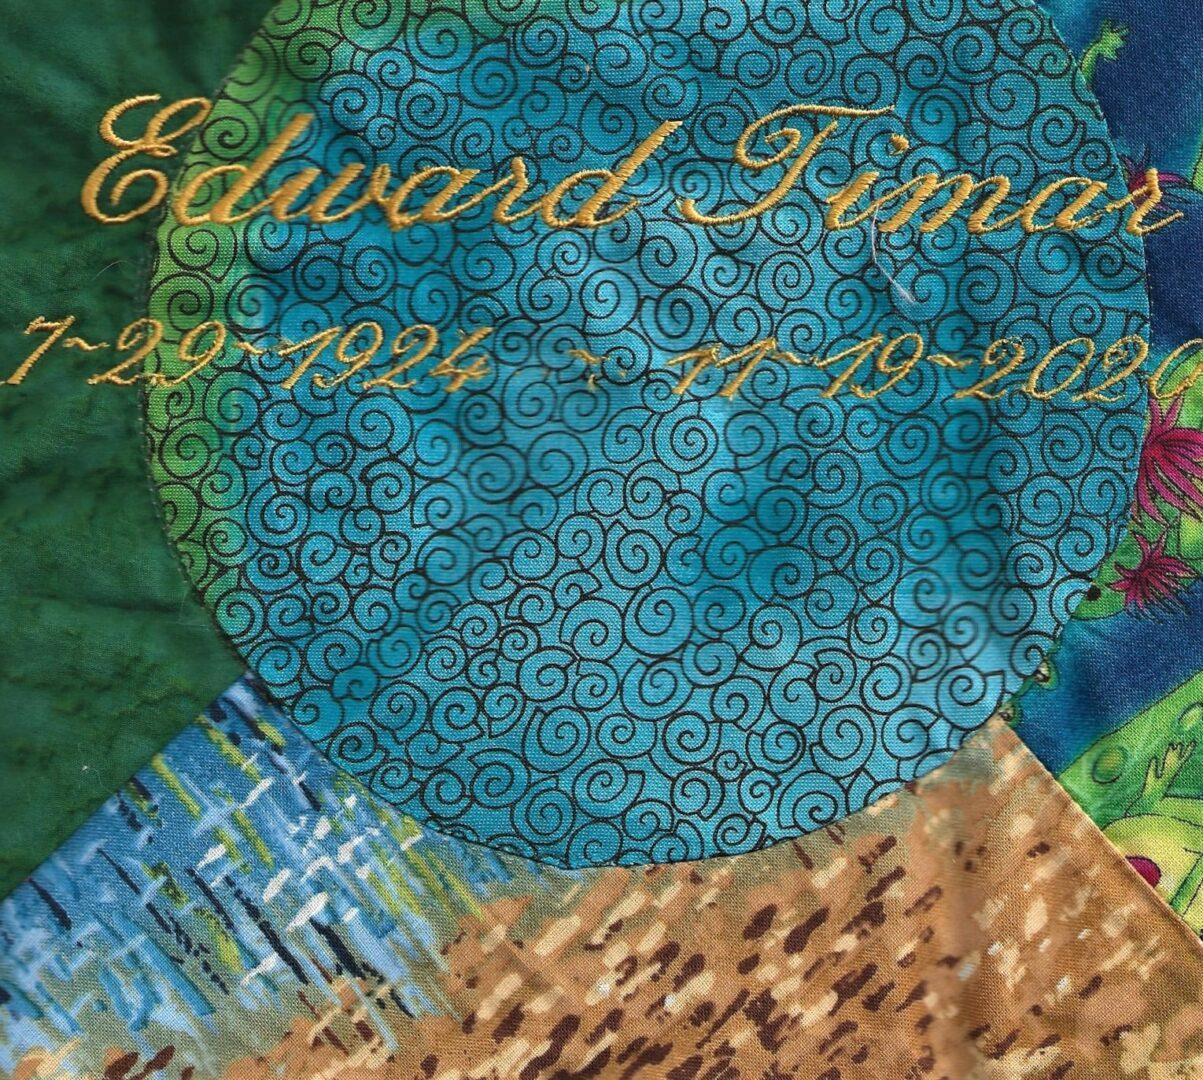 IN MEMORY OF EDWARD TIMAR - 7/29/1924 - 11/19/2020